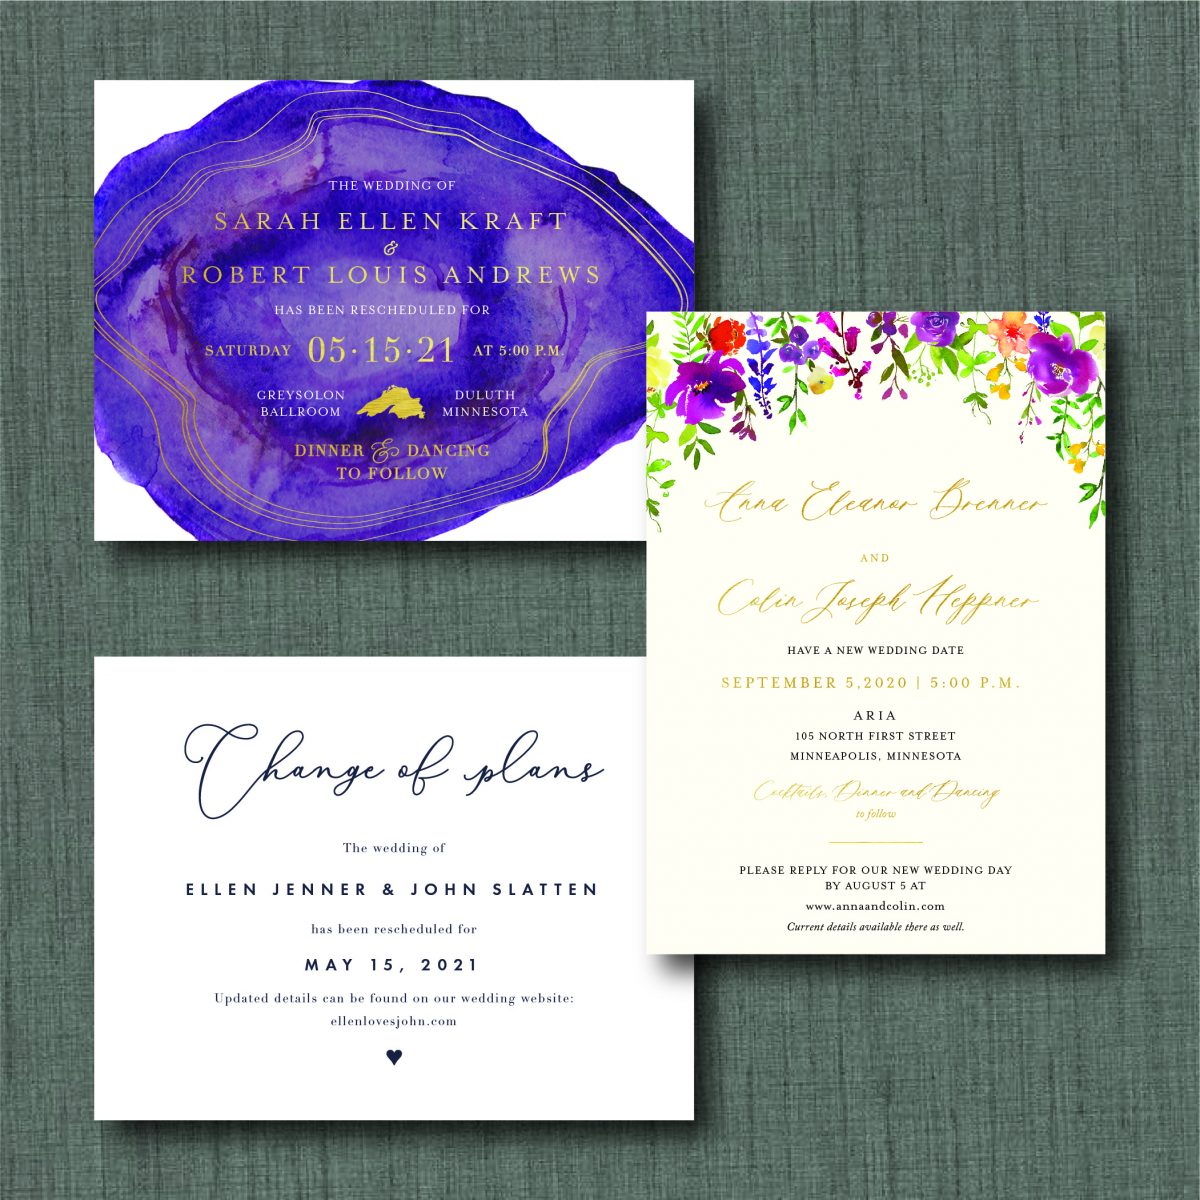 Wedding invite postpone the date